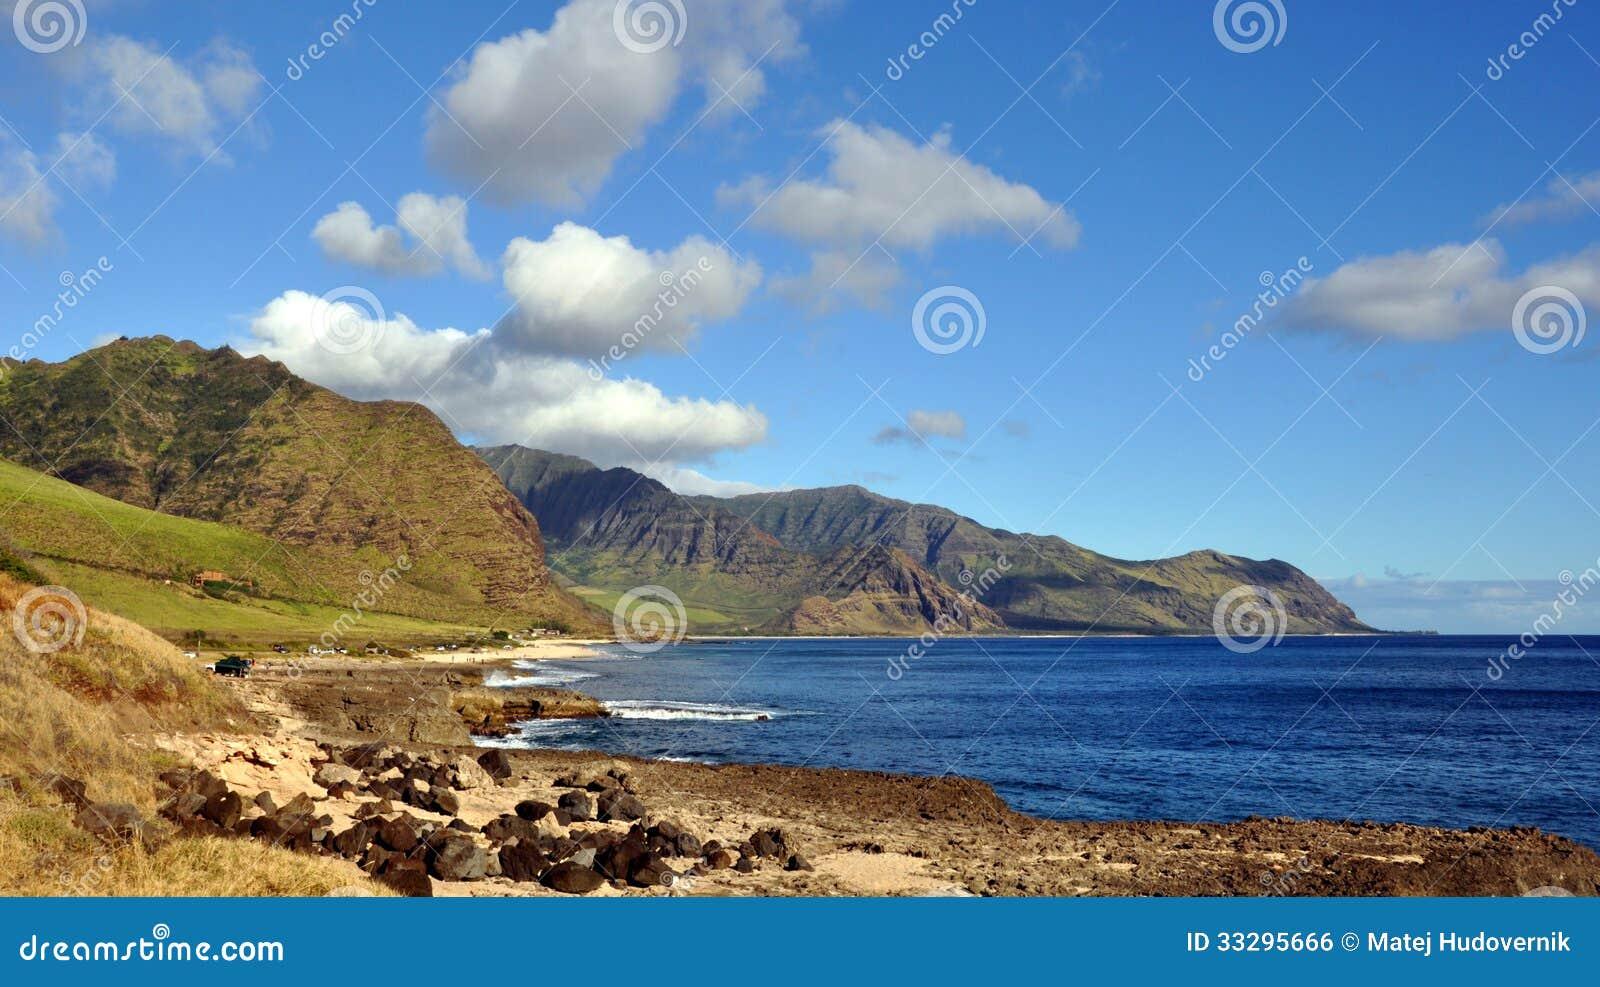 stock image of hawaiian - photo #12